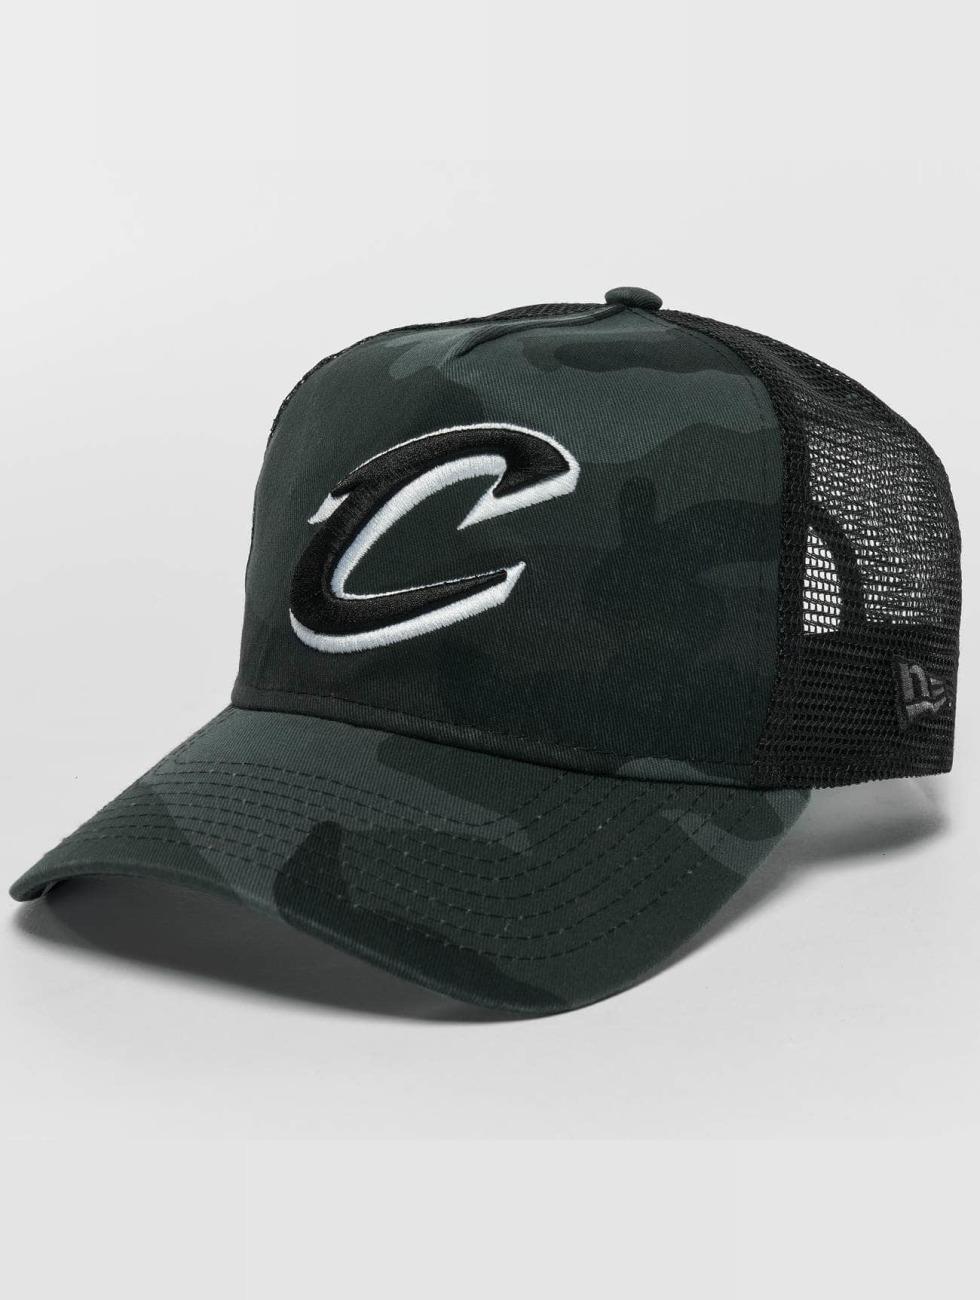 New Era Trucker Caps Washed Camo Cleveland Cavaliers Trucker Cap kamuflasje